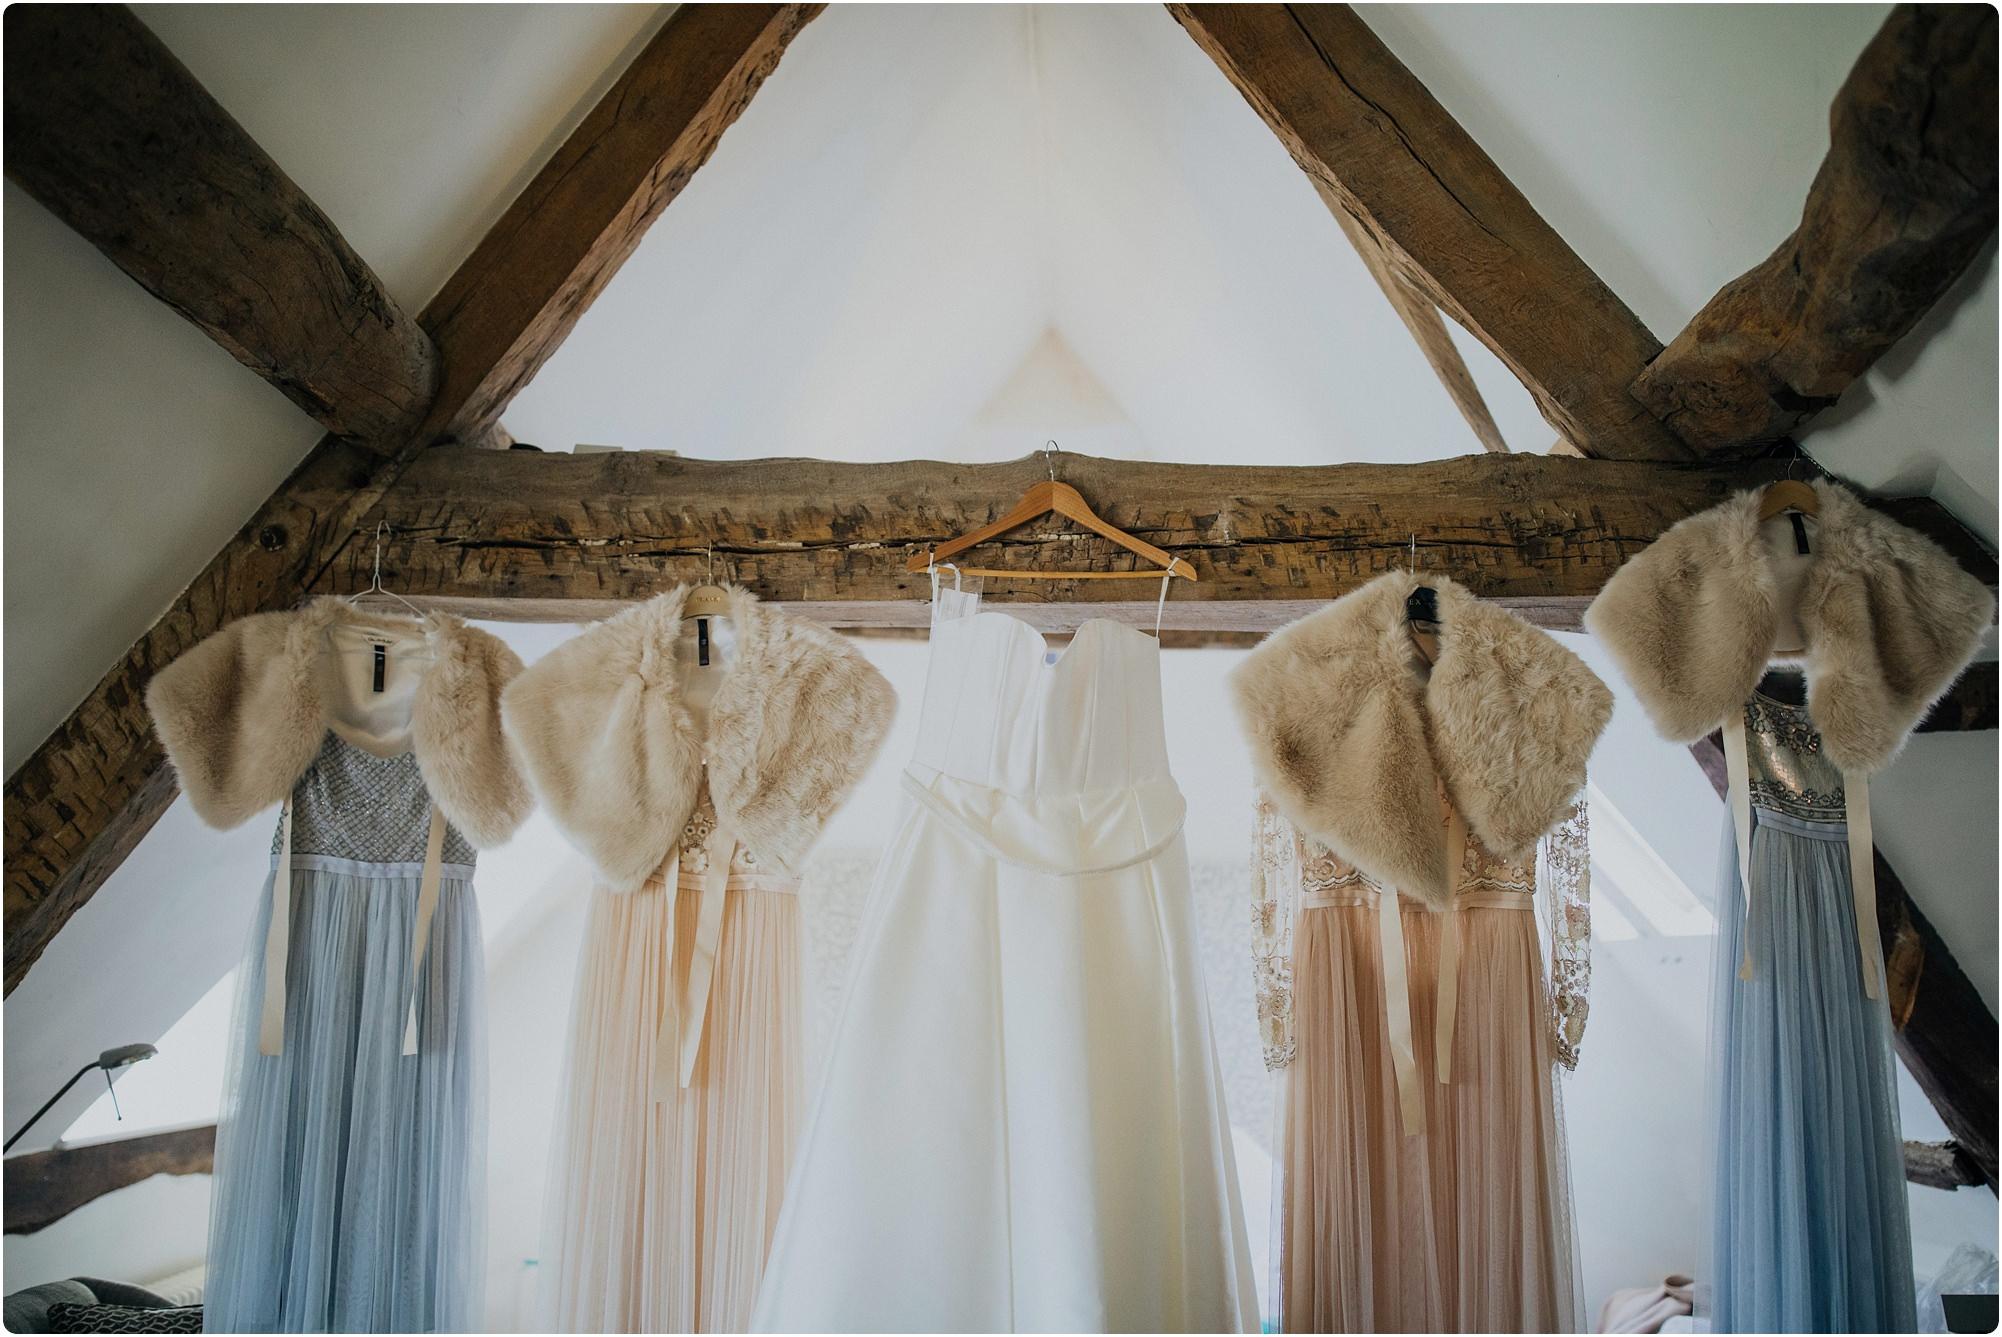 needle and thread bridesmaid dresses hanging up at Barnsley House Wedding